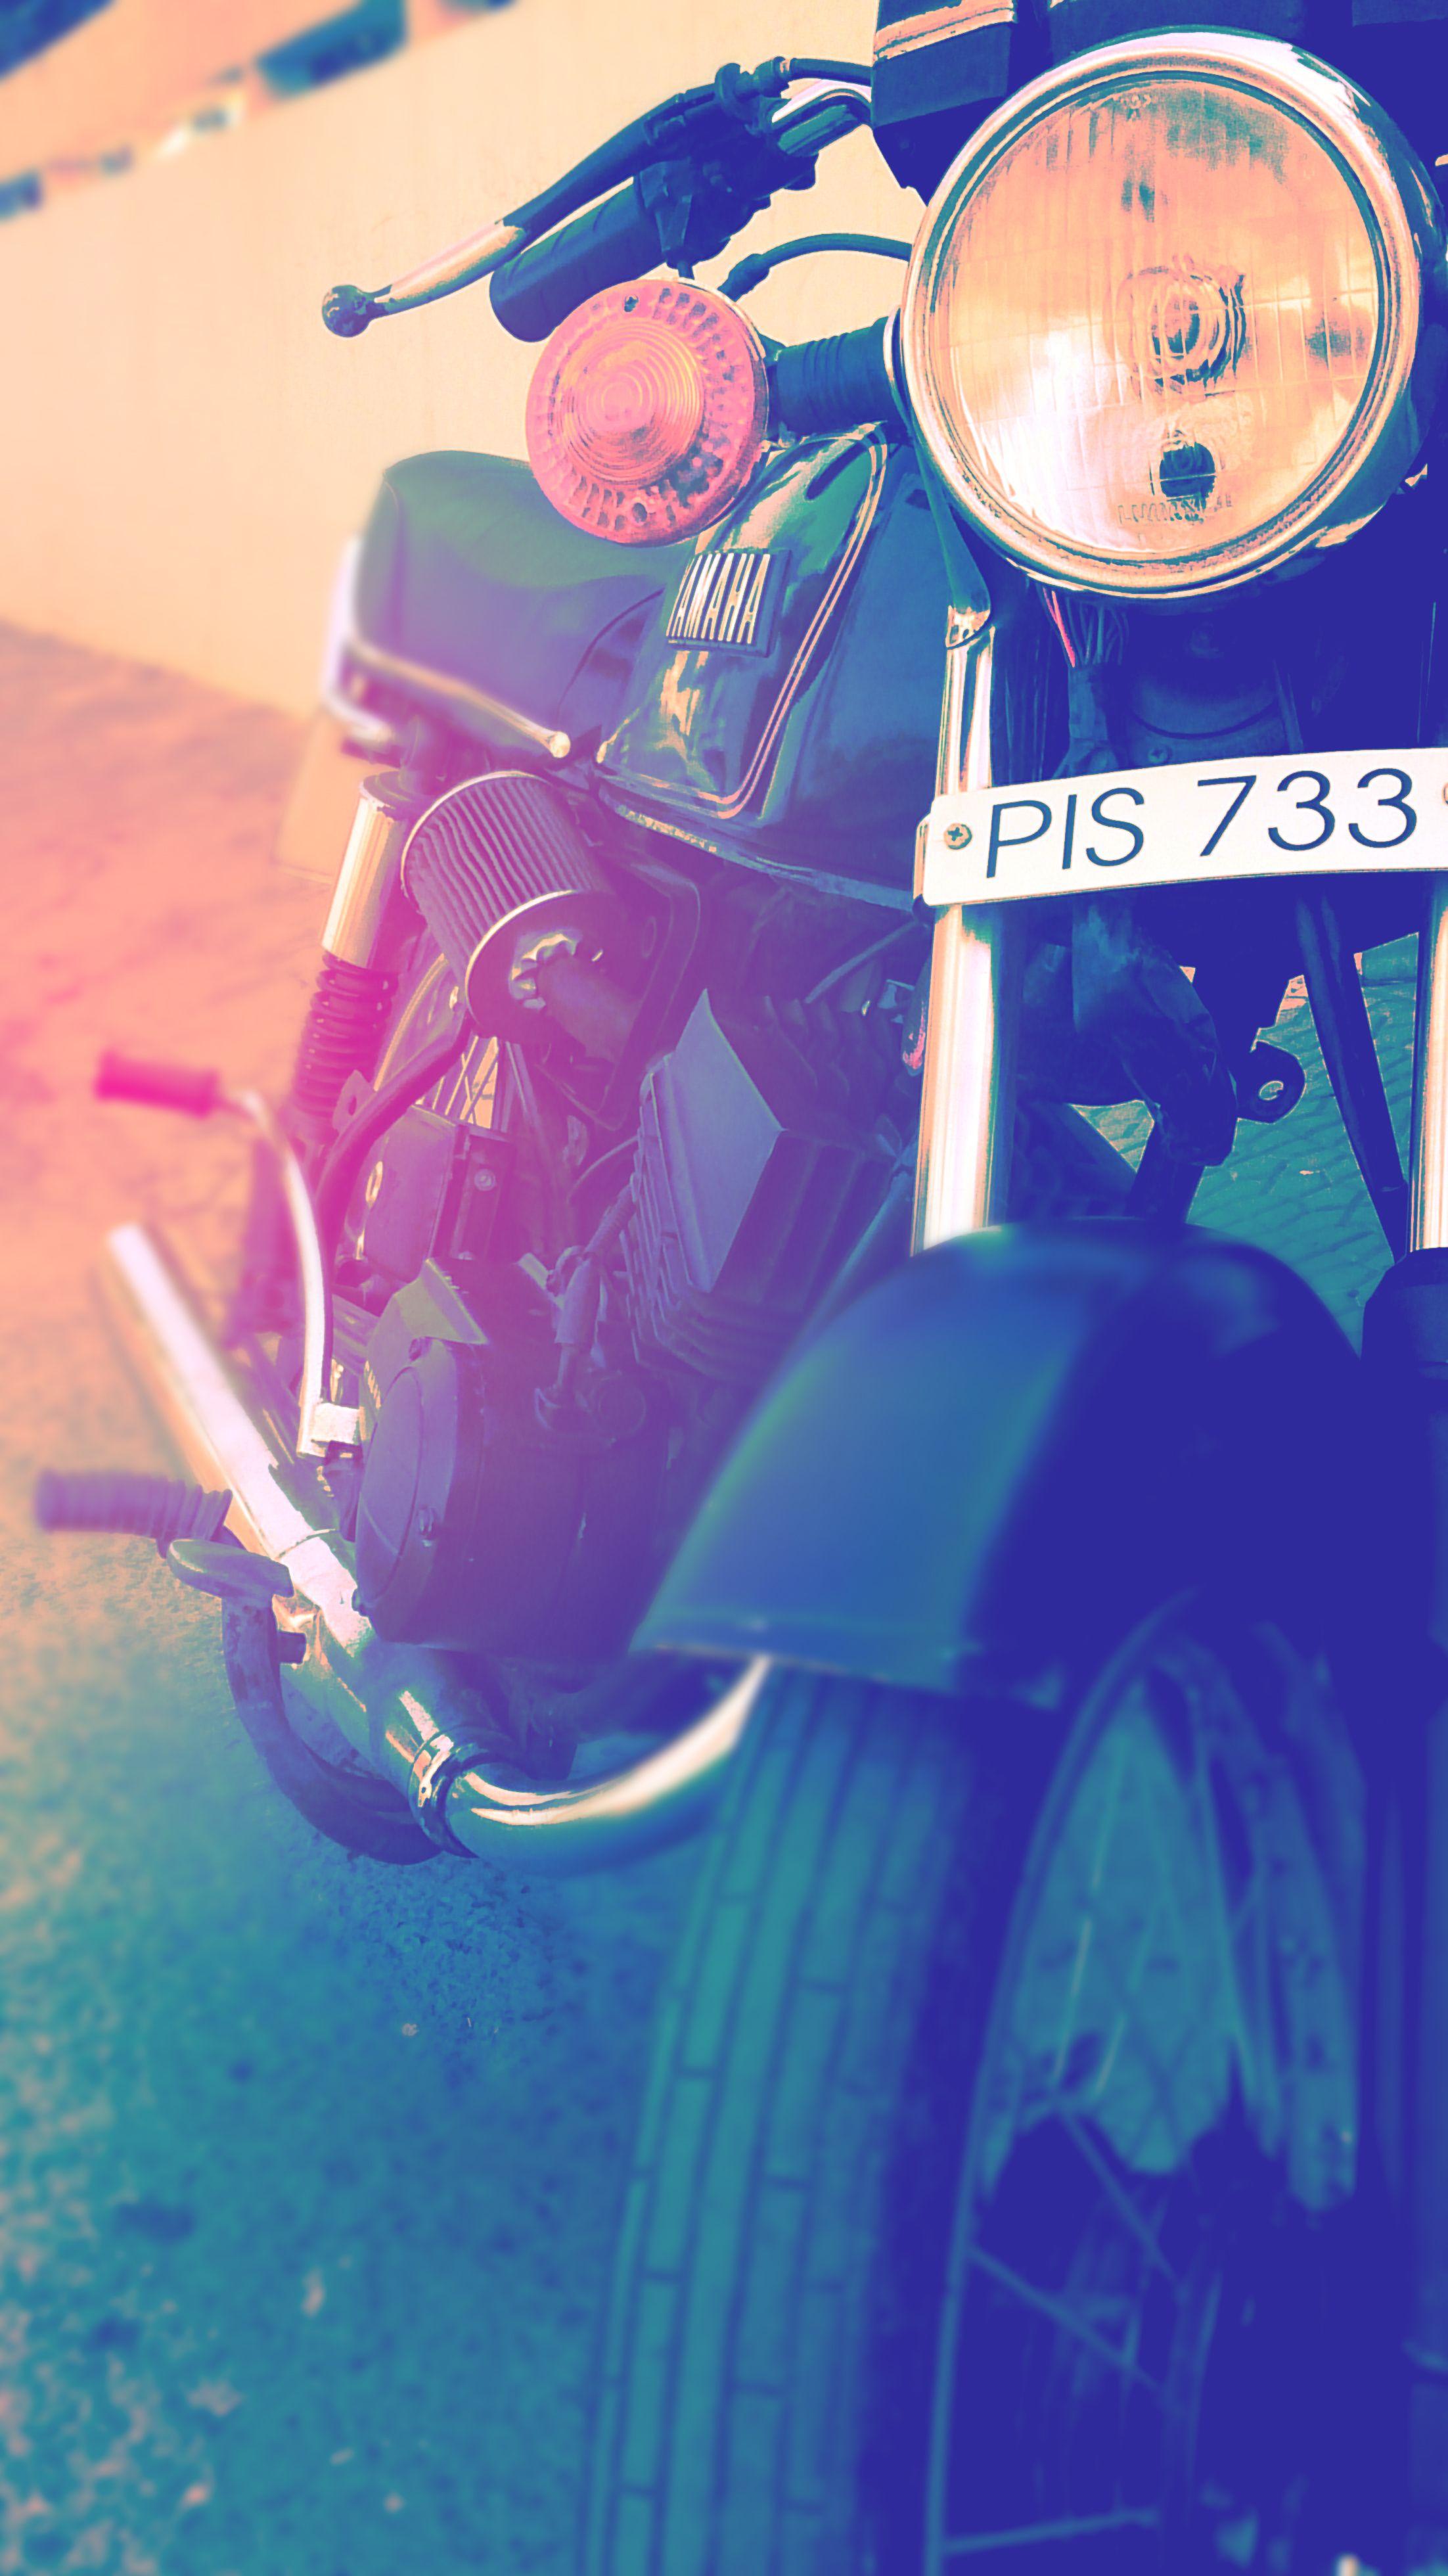 Arsh Nanray S Ride Yamaha Rx100 With Images Yamaha Rx100